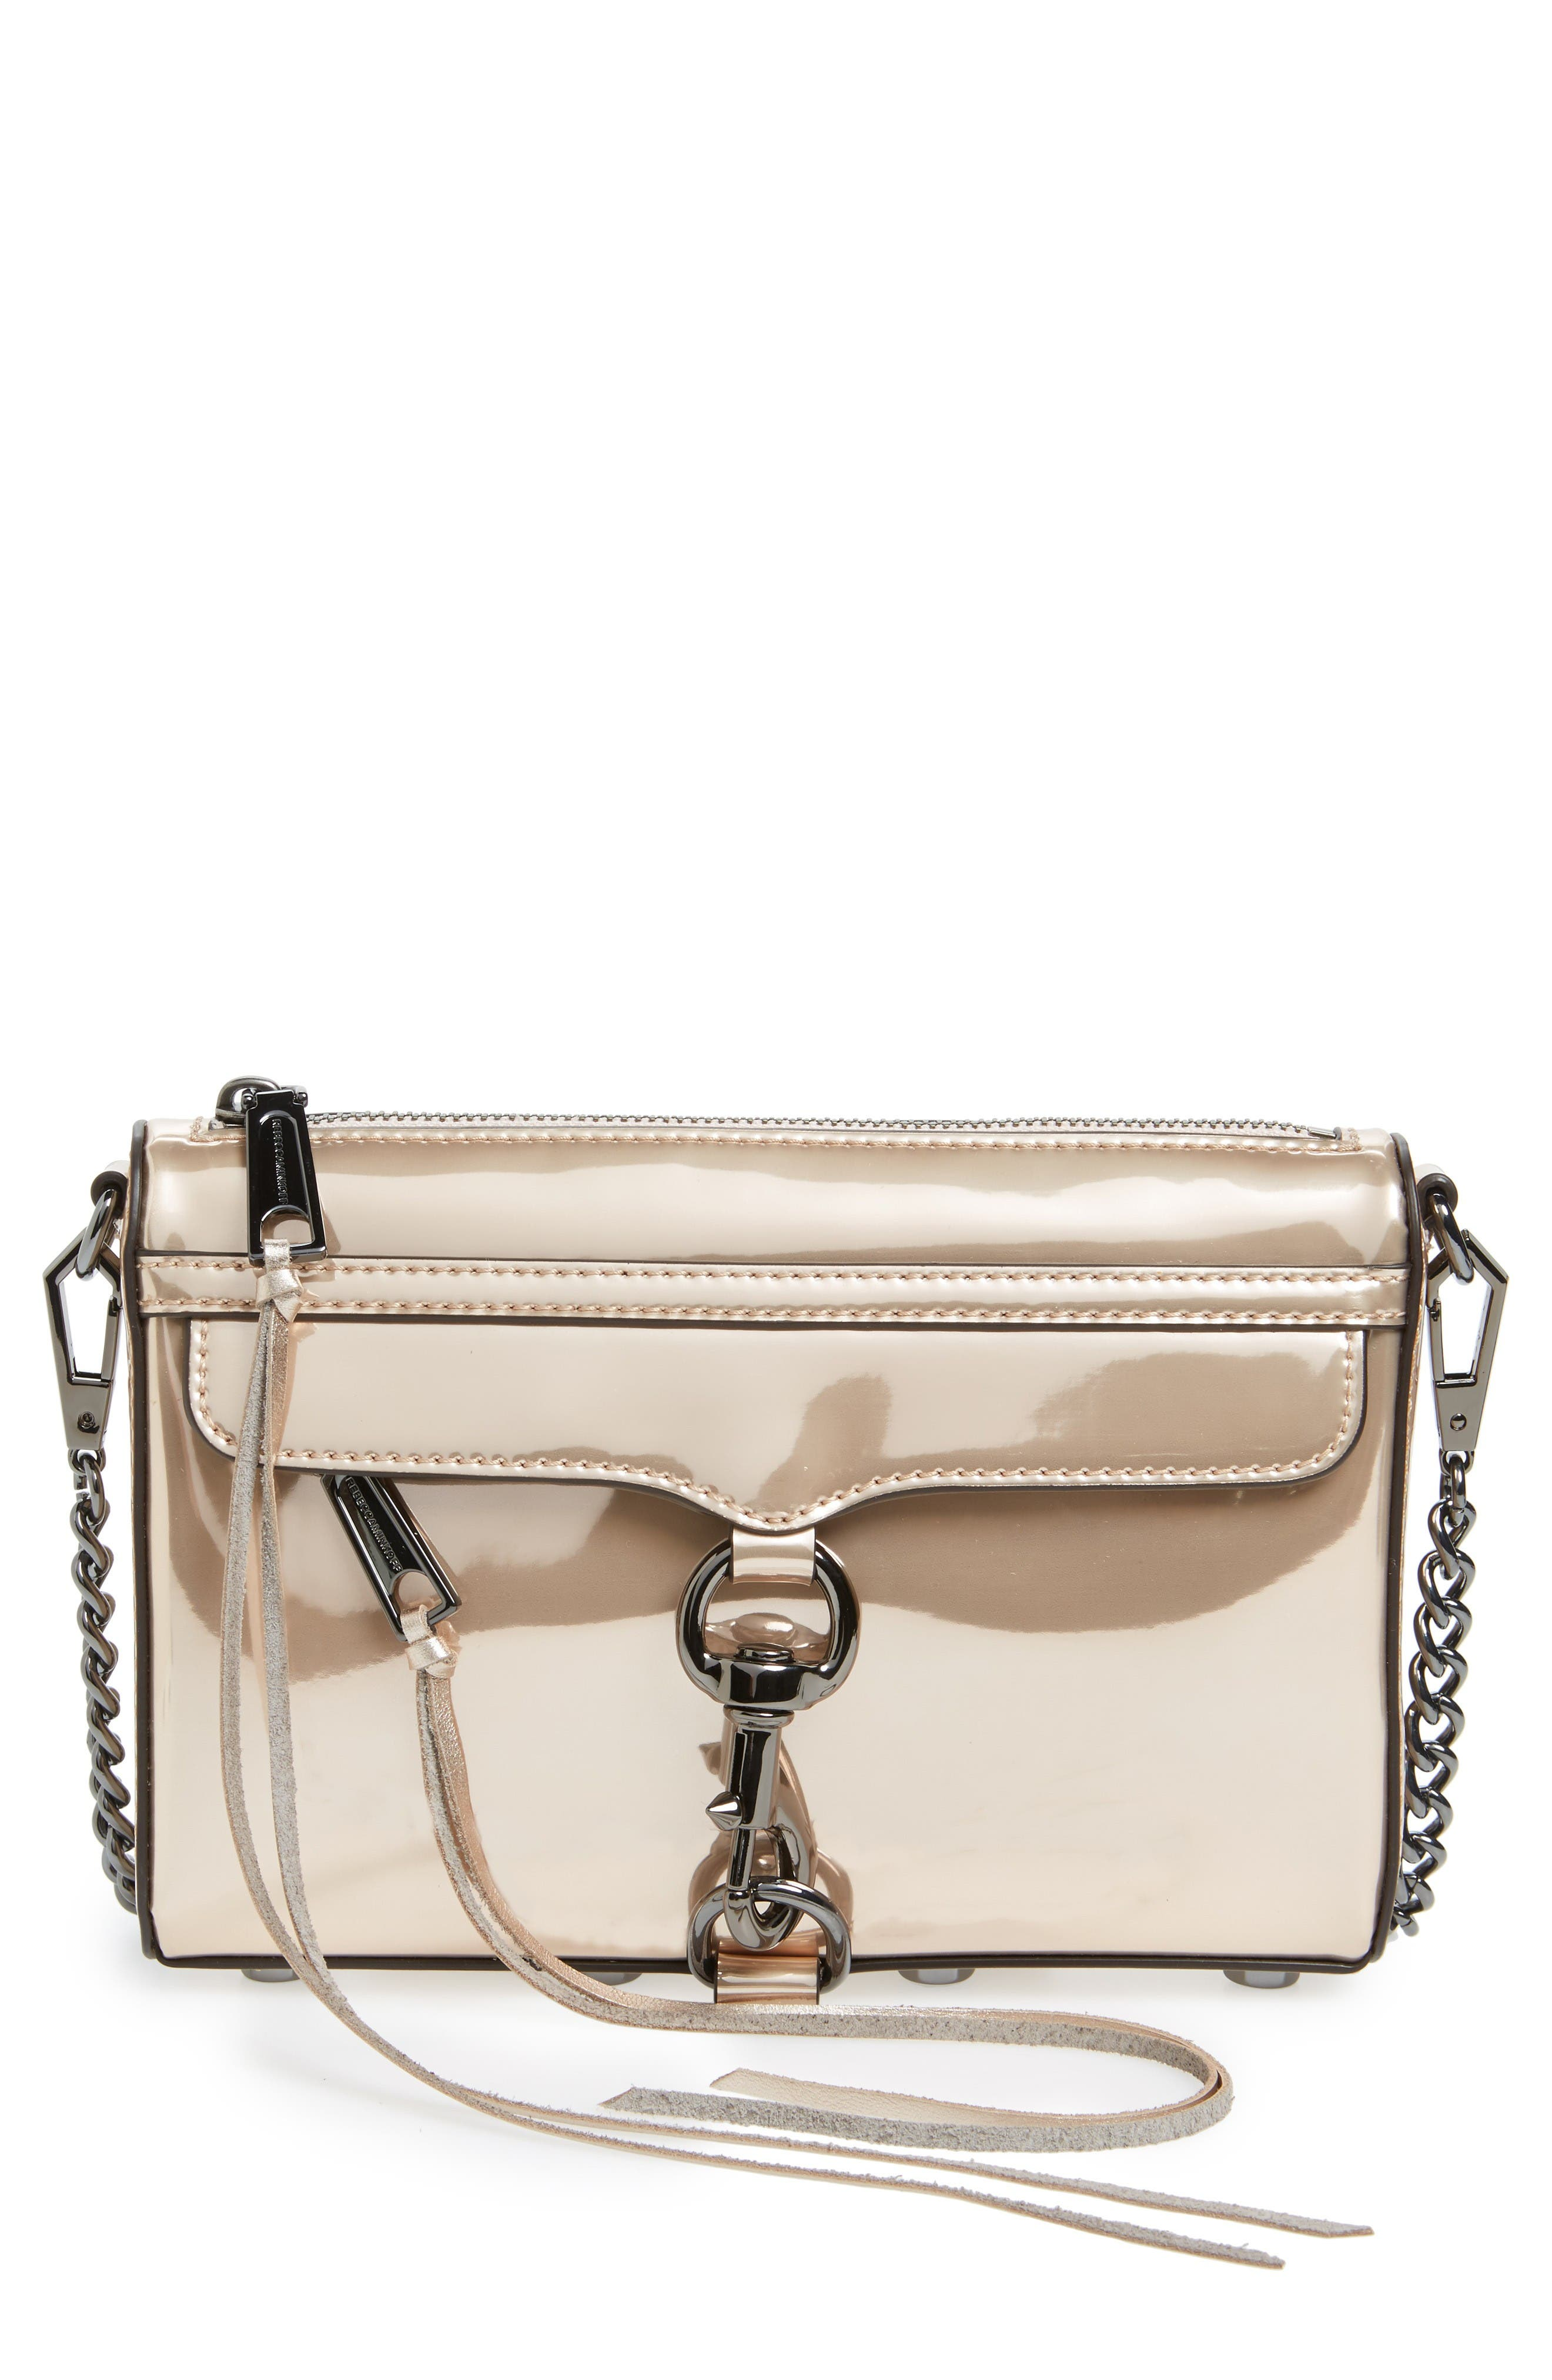 Main Image - Rebecca Minkoff Mini MAC Convertible Crossbody Bag